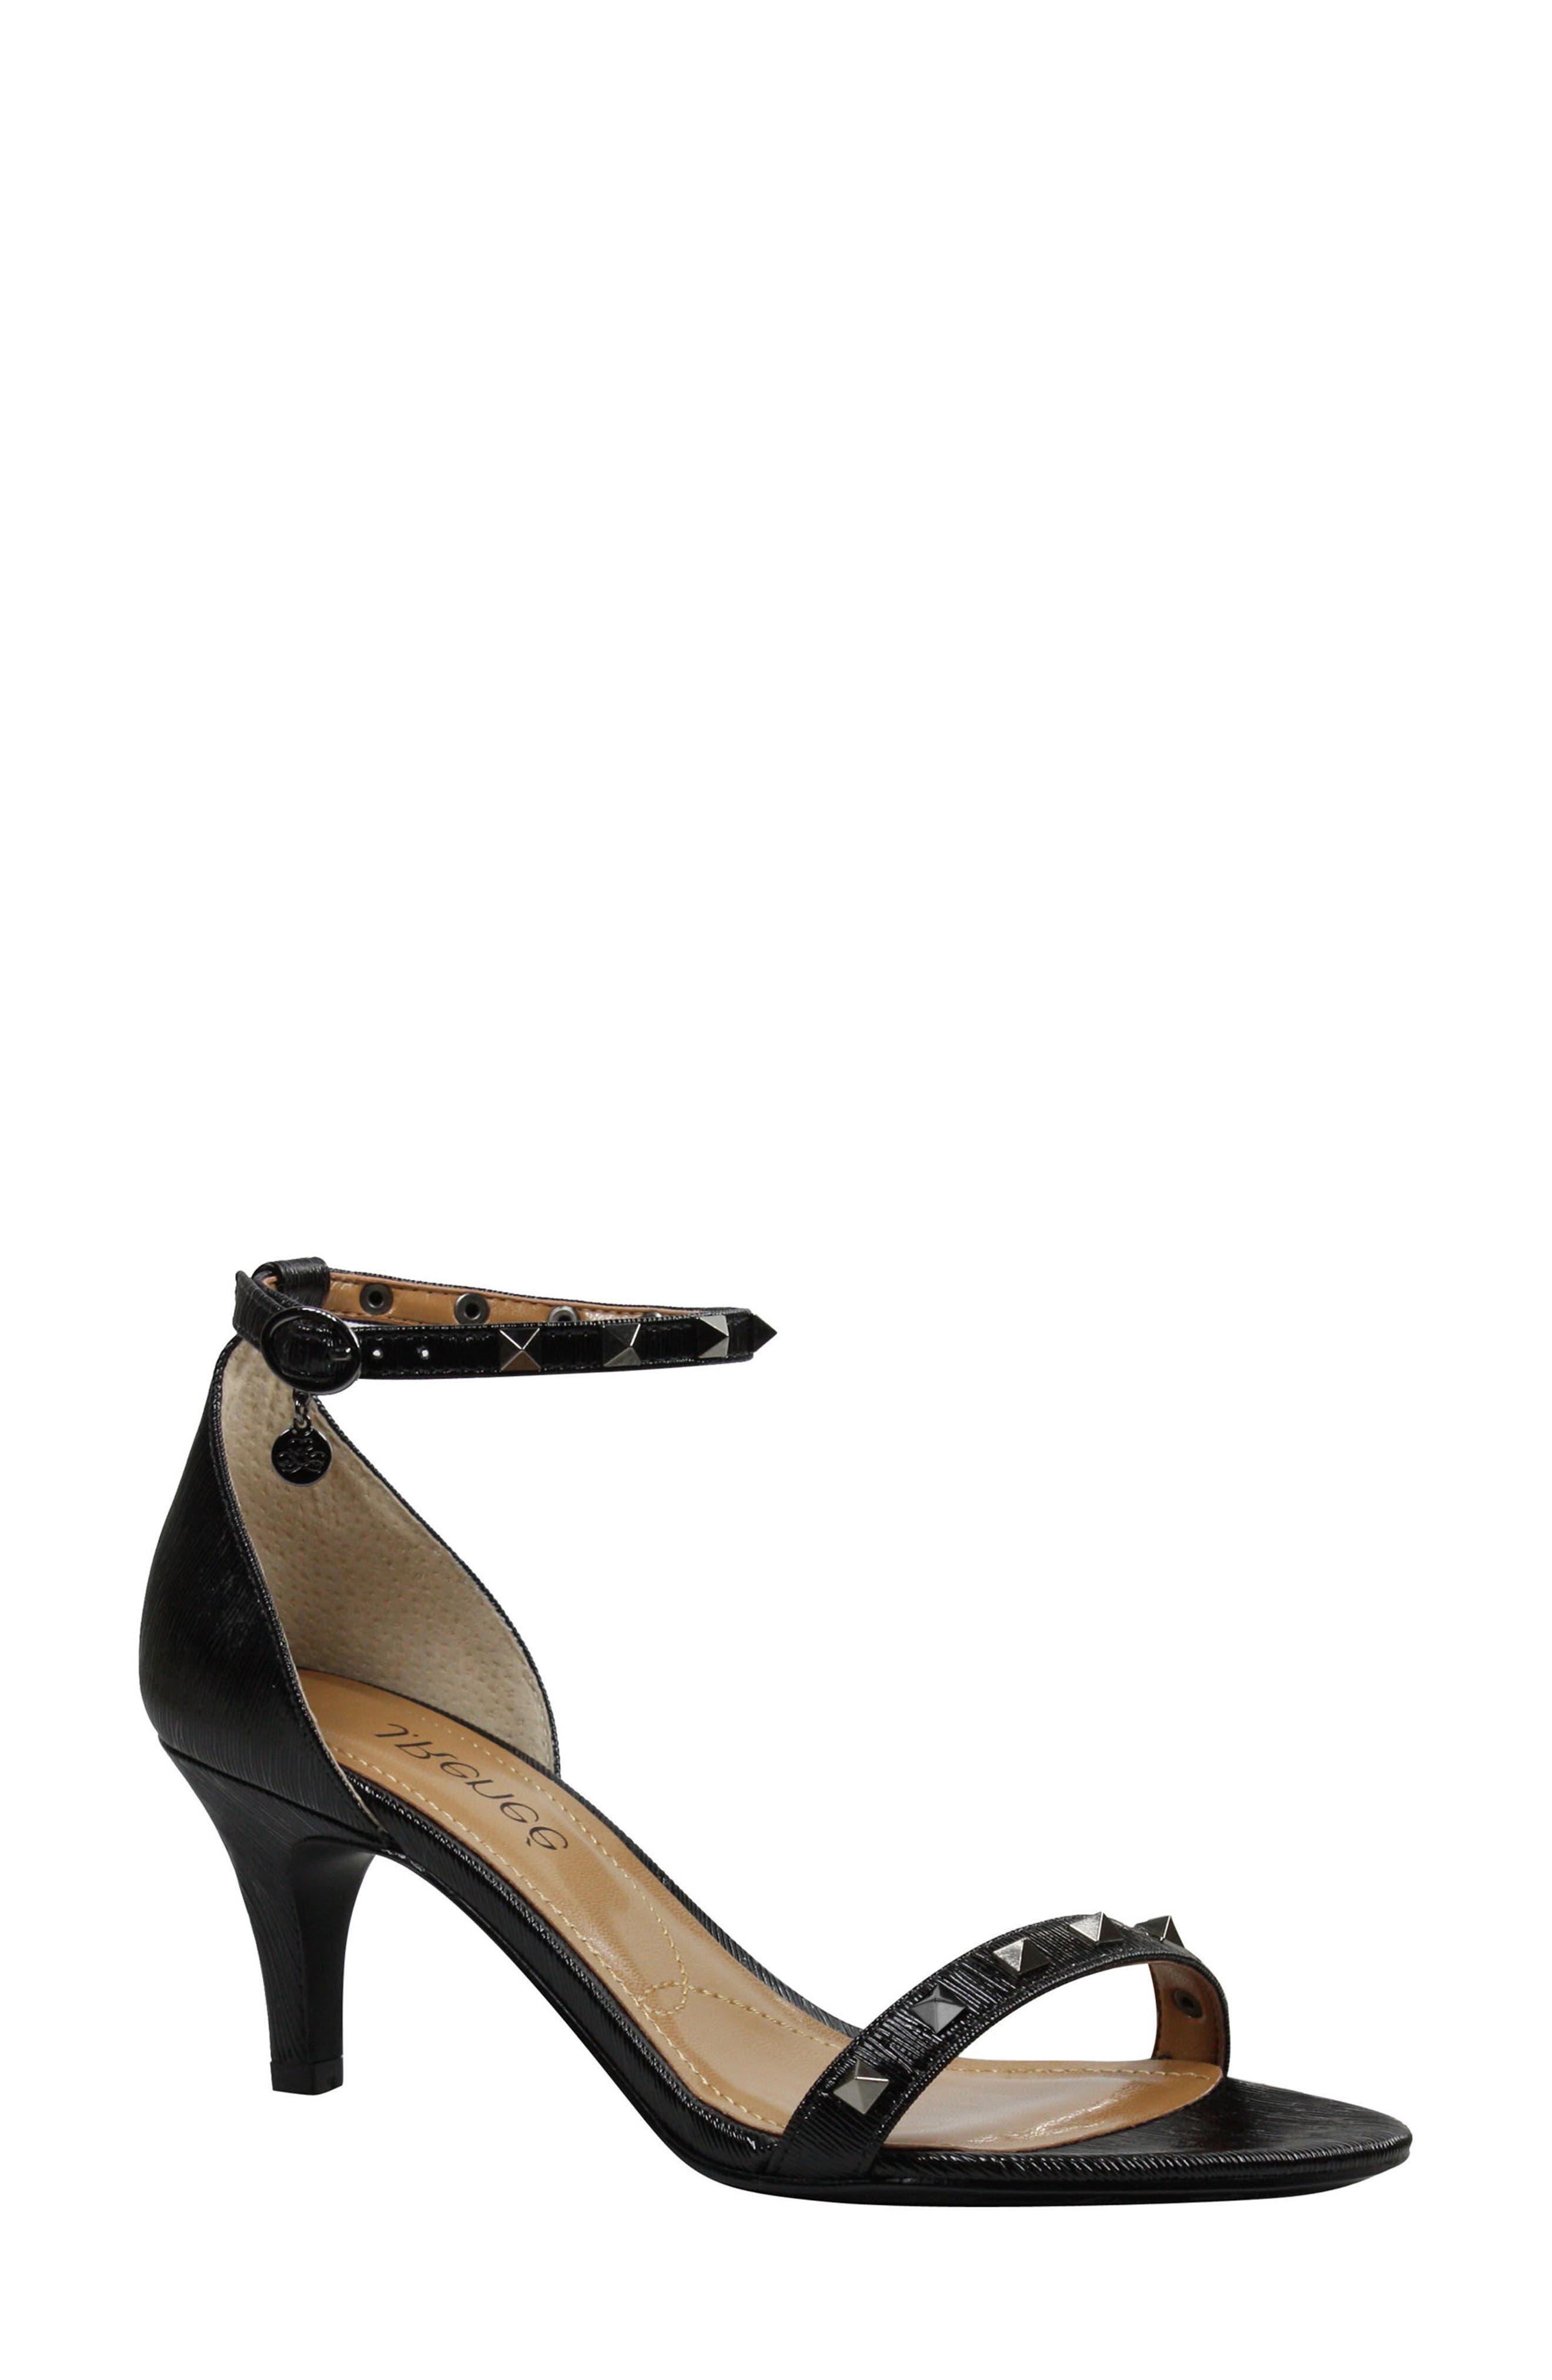 Lerida Studded Ankle Strap Sandal,                             Main thumbnail 1, color,                             001